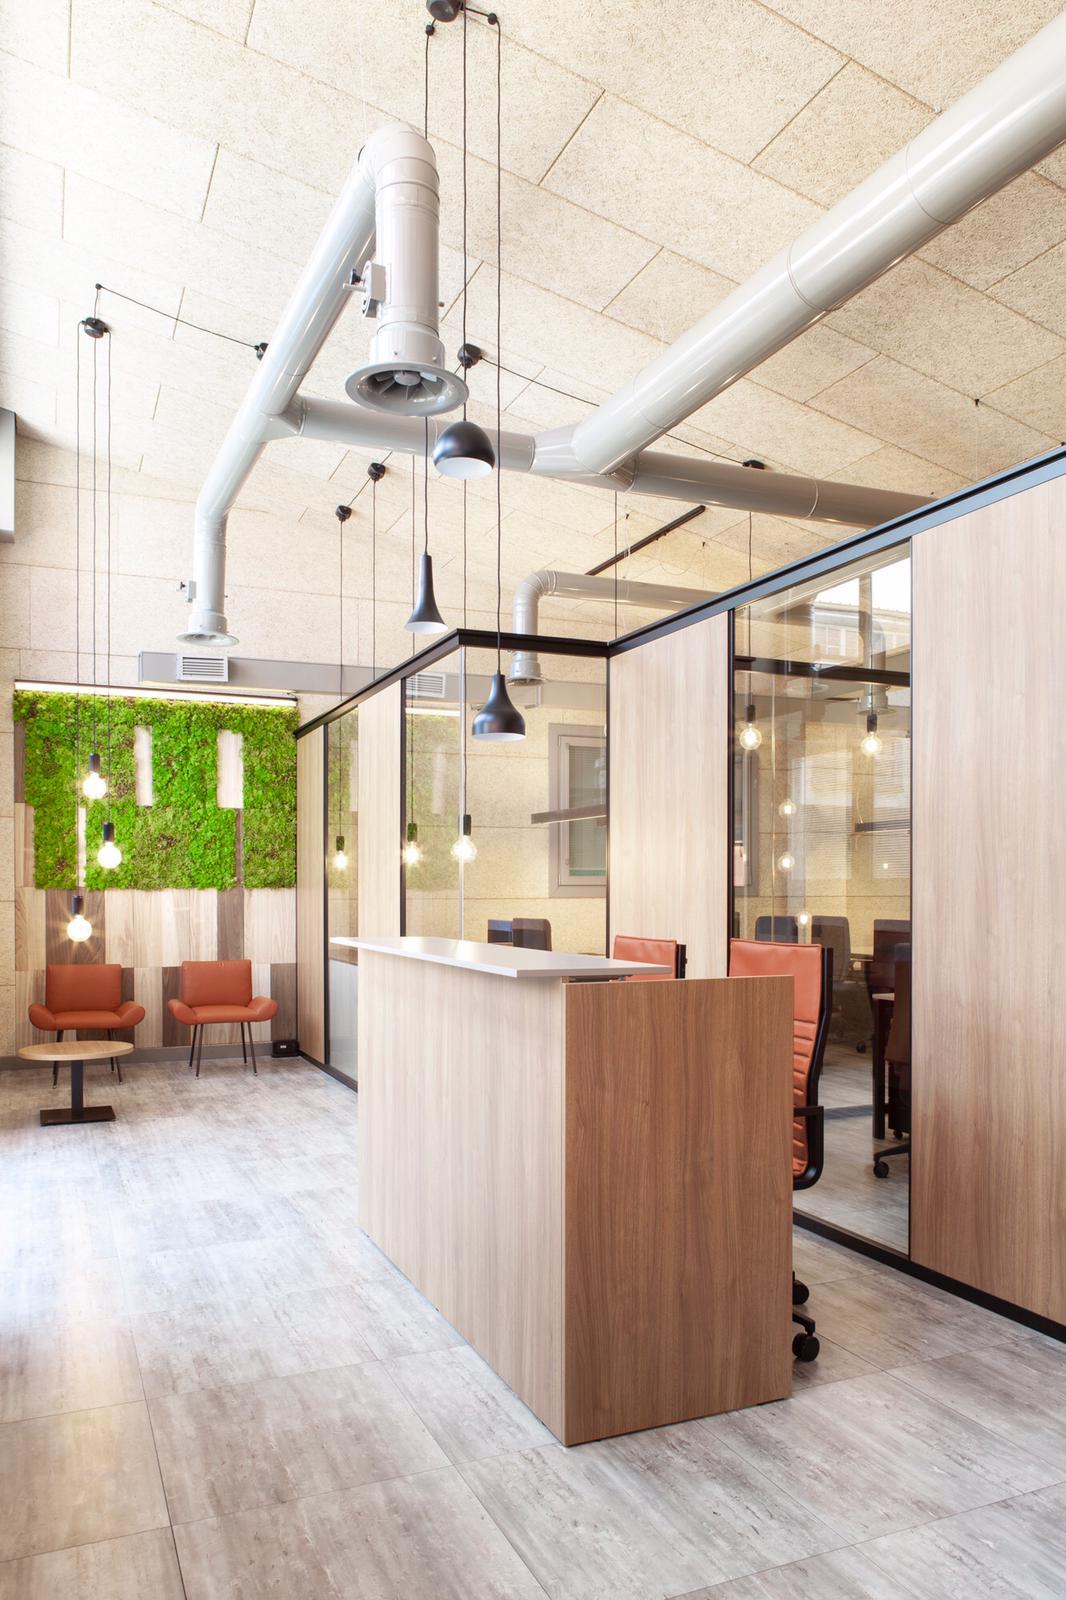 Uffici in stile industrial_ingresso